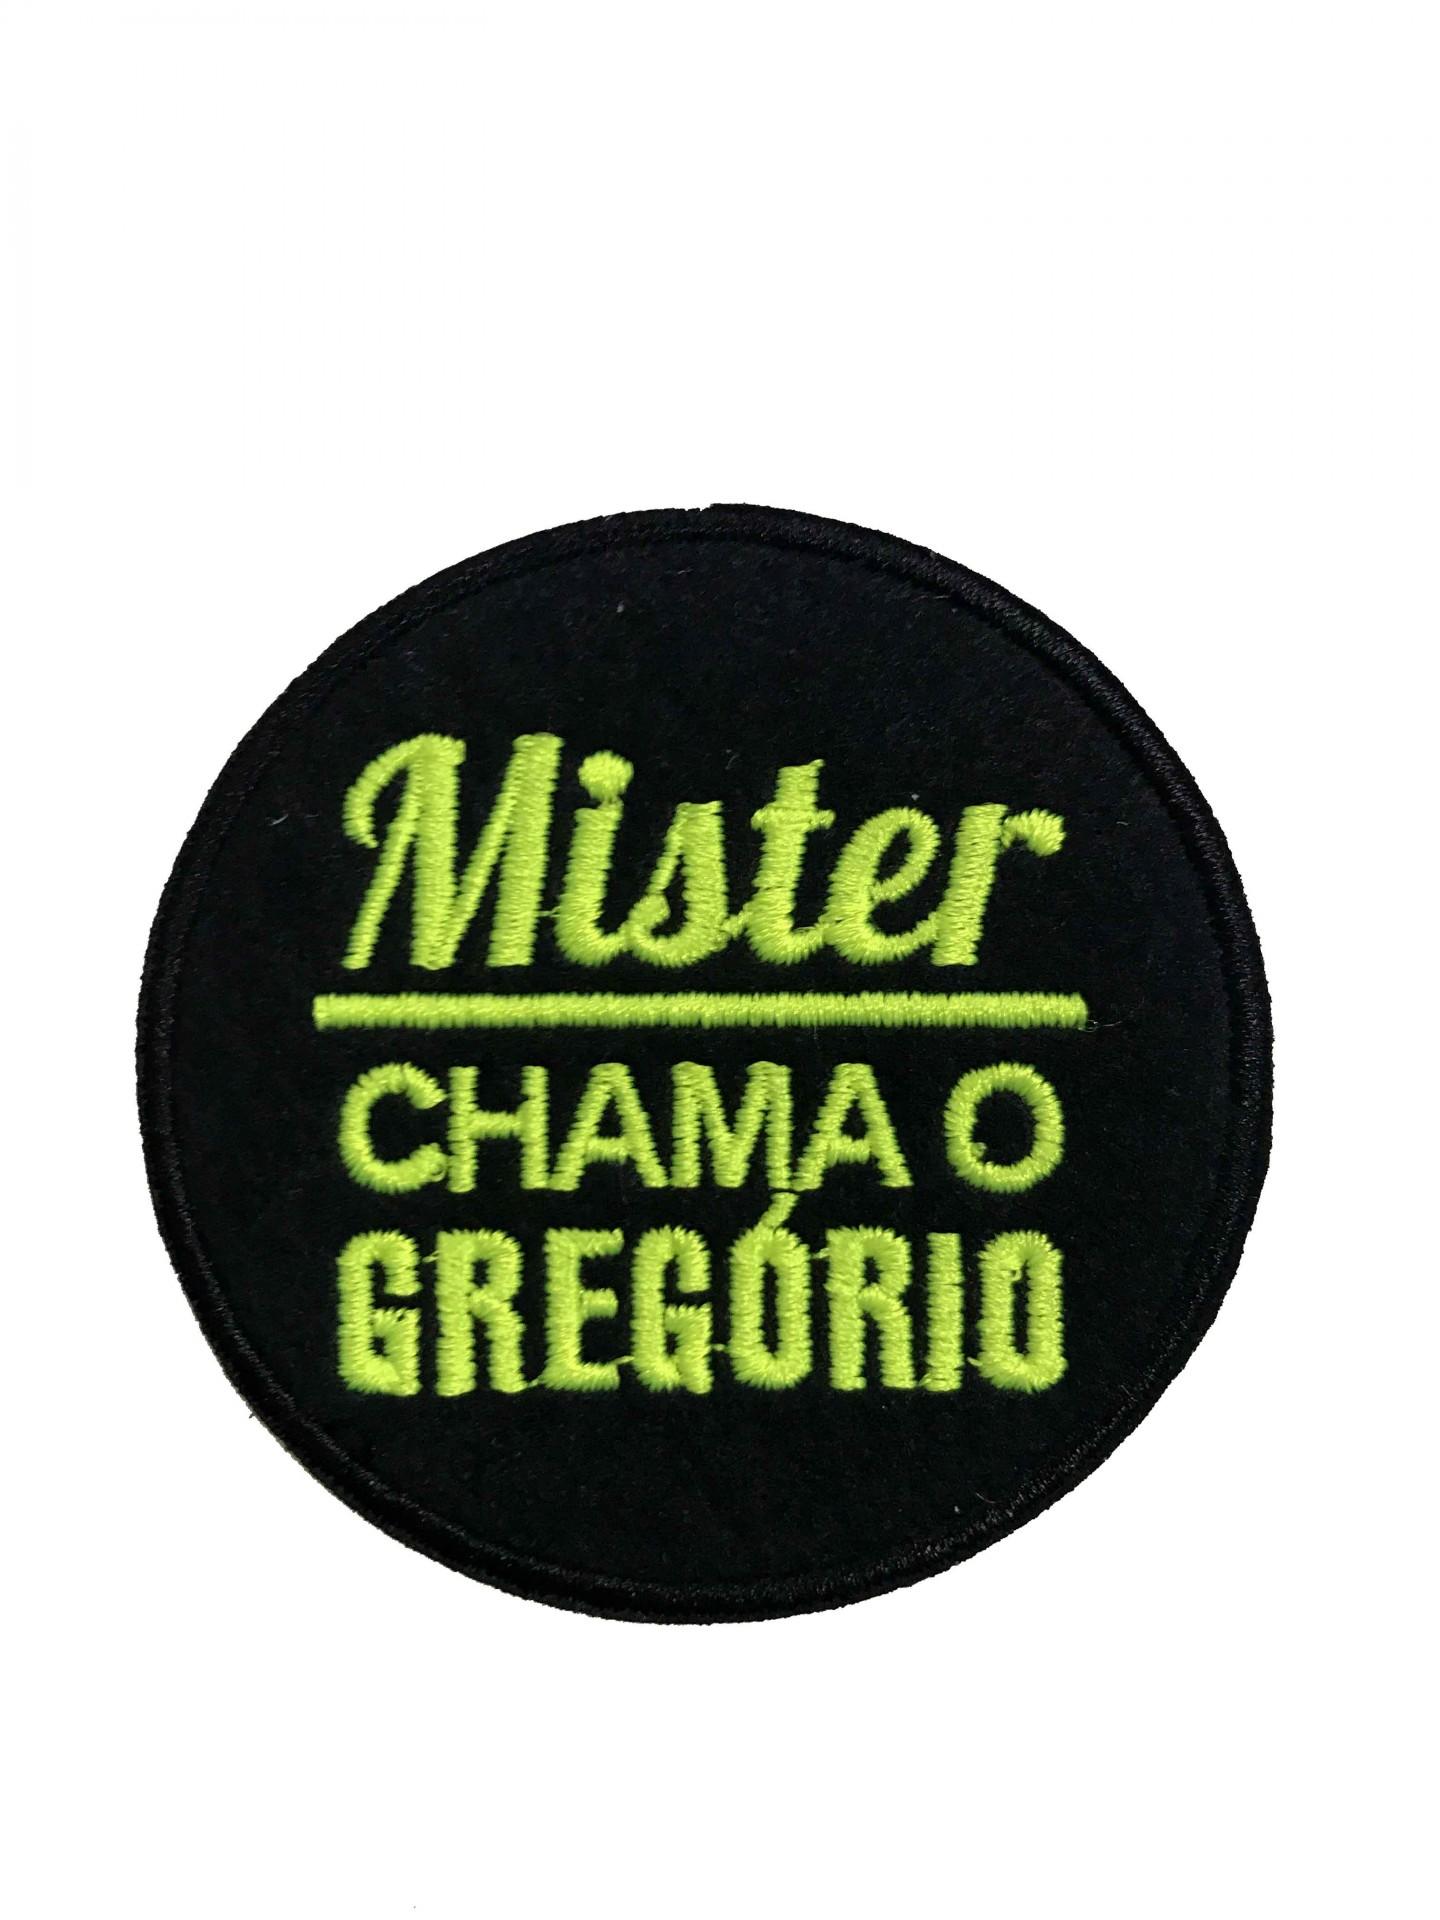 Emblema Mister chama o gregório